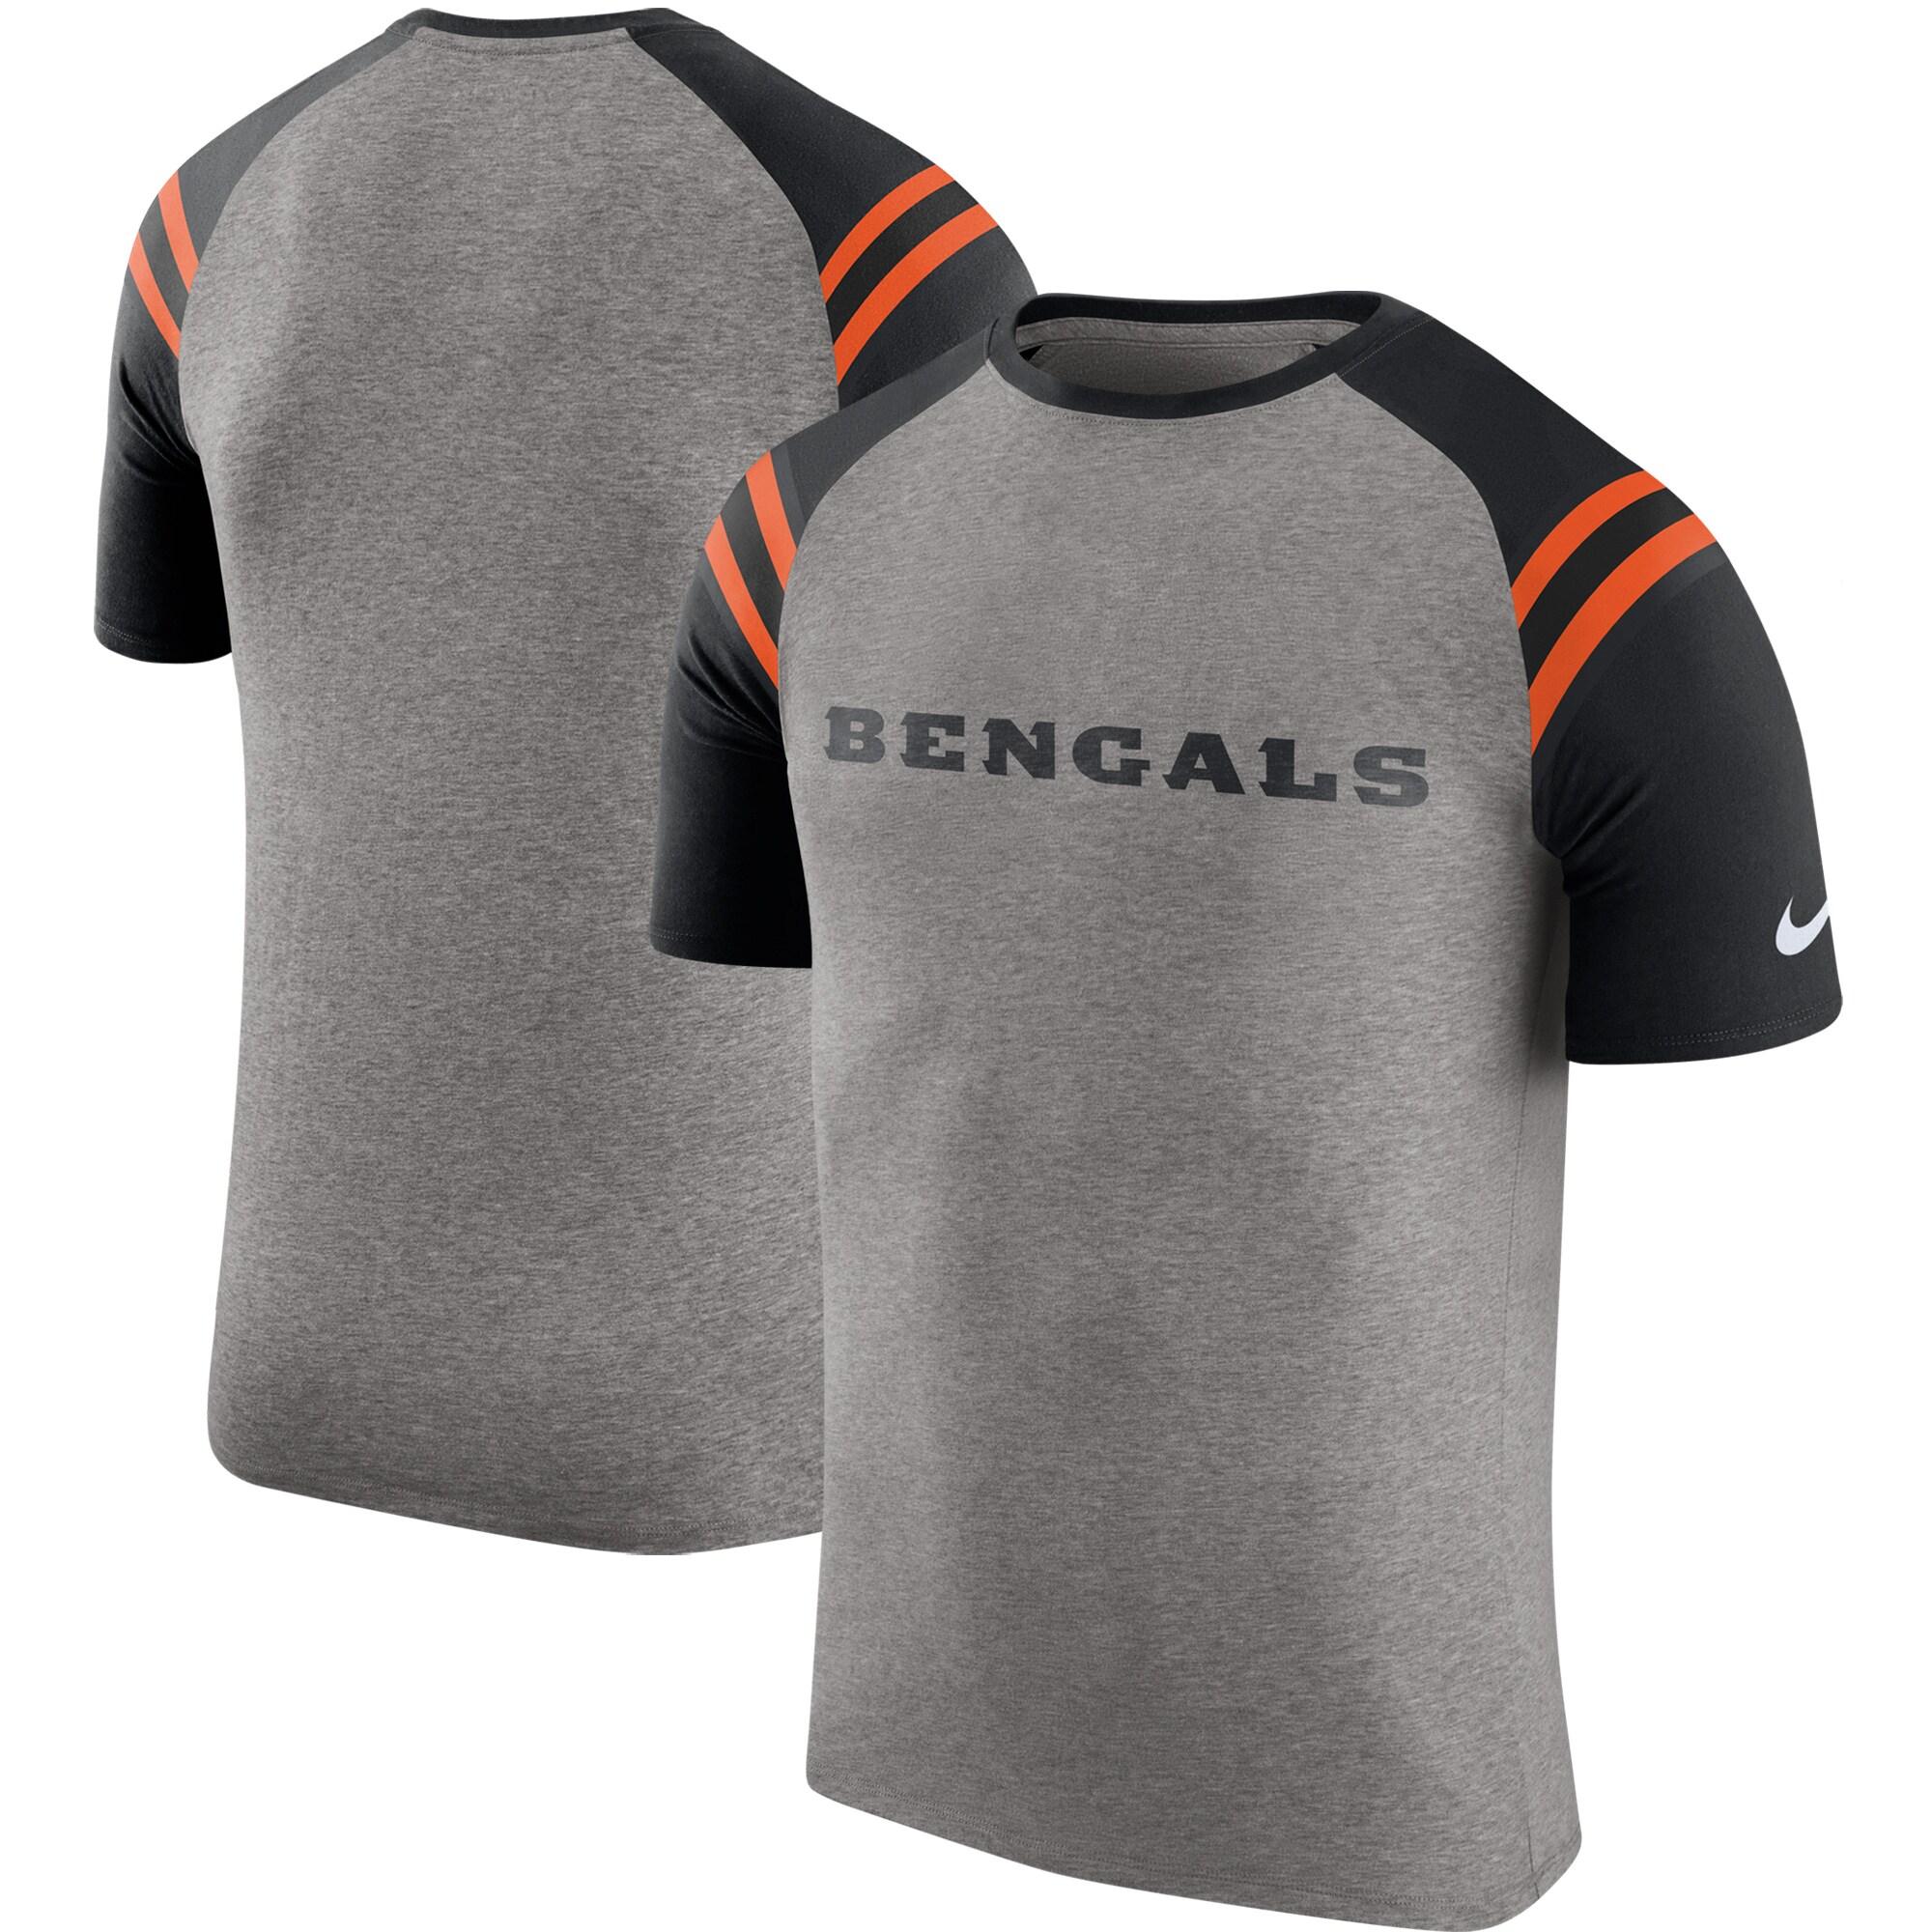 Cincinnati Bengals Nike Enzyme Shoulder Stripe Raglan T-Shirt - Heathered Gray